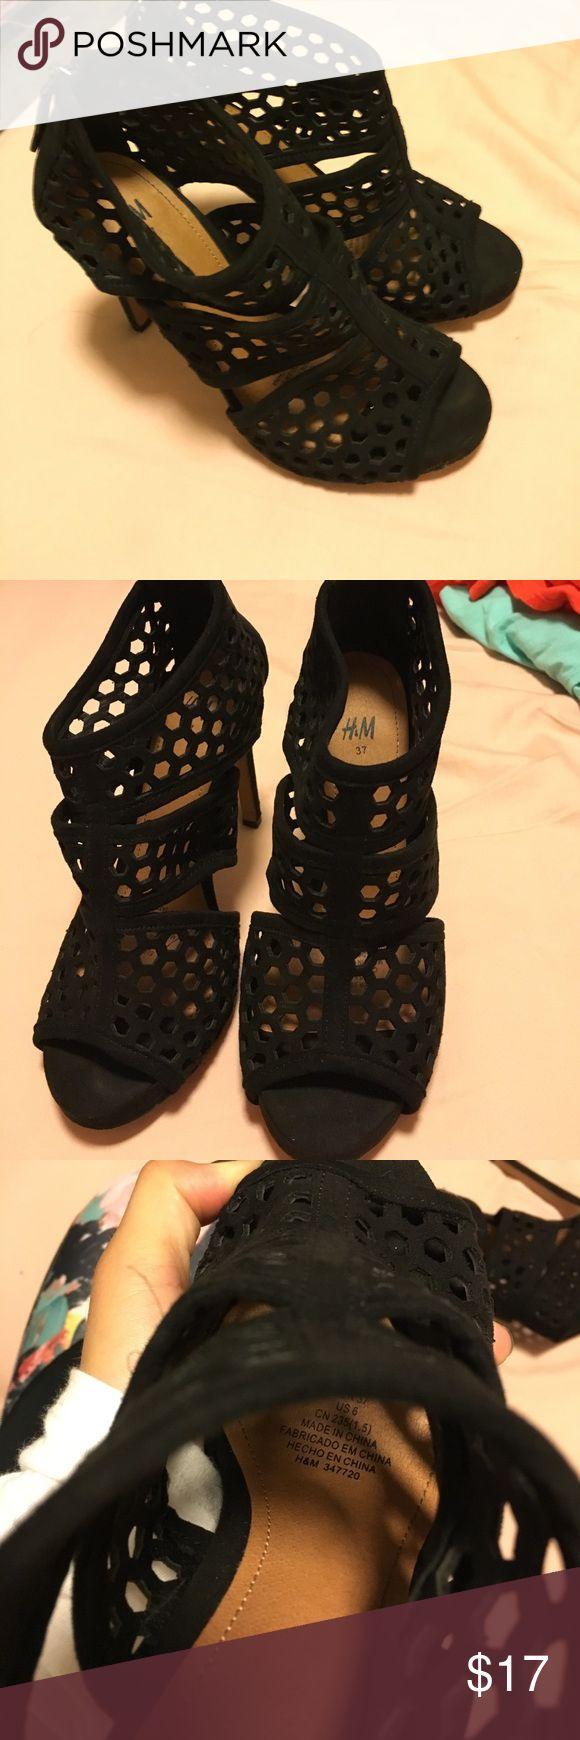 "Black heels Black heels with peep toe, H&M size 6 with a 5"" heel H&M Shoes Heels"